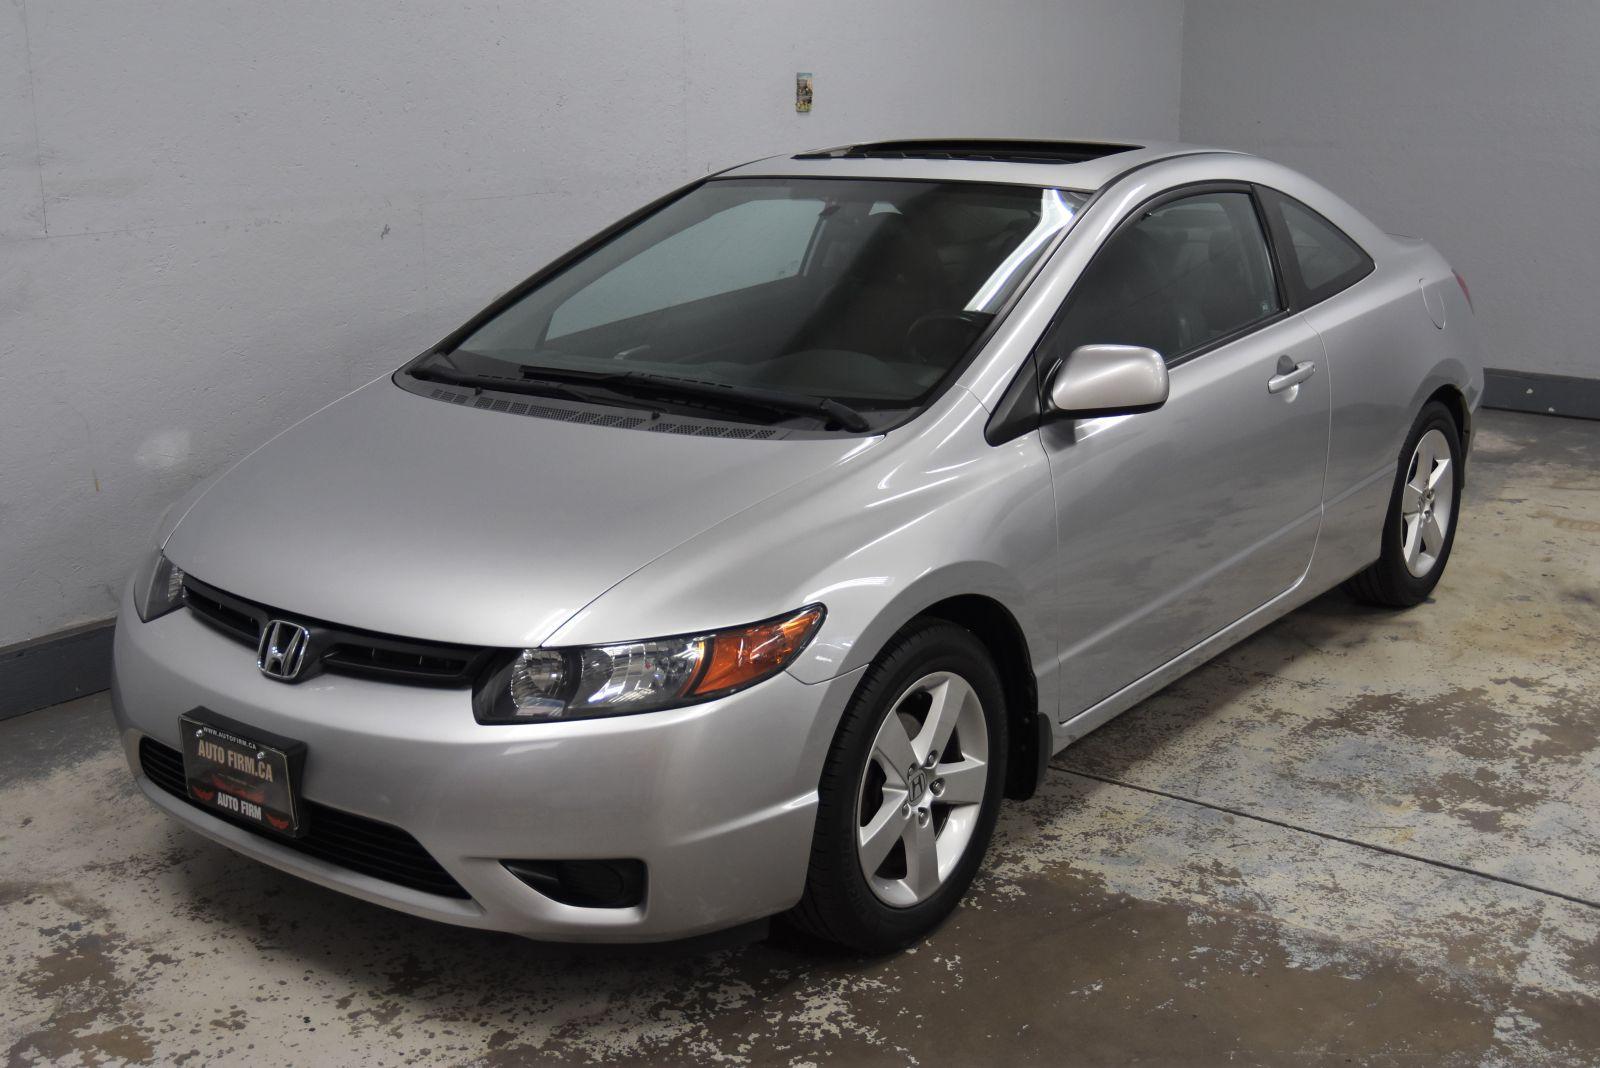 2008 Honda Civic Cpe Image